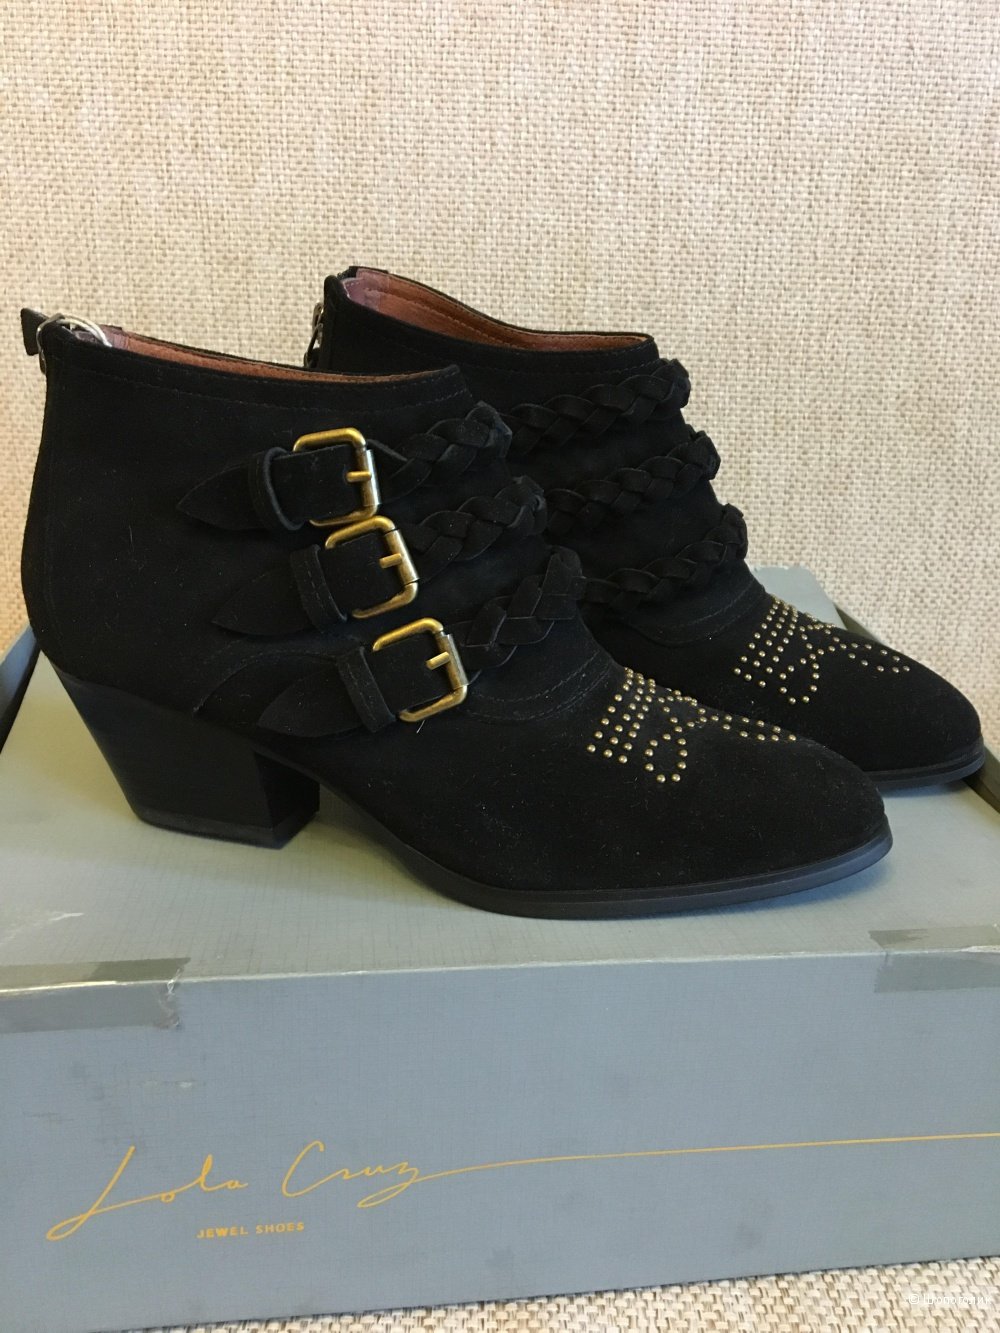 Ботинки Lola Cruz, 38 размер